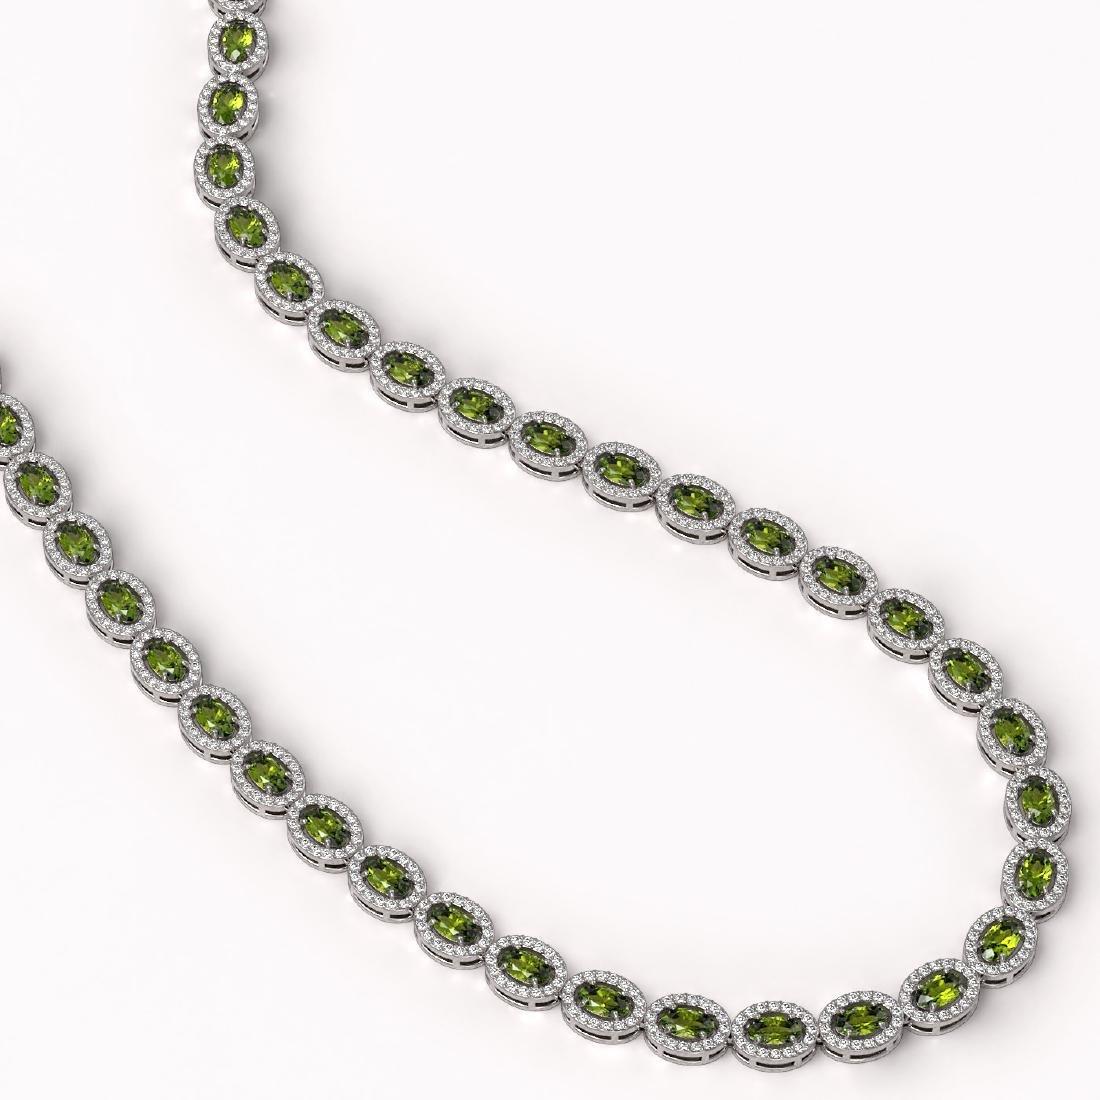 23.57 CTW Tourmaline & Diamond Halo Necklace 10K White - 2